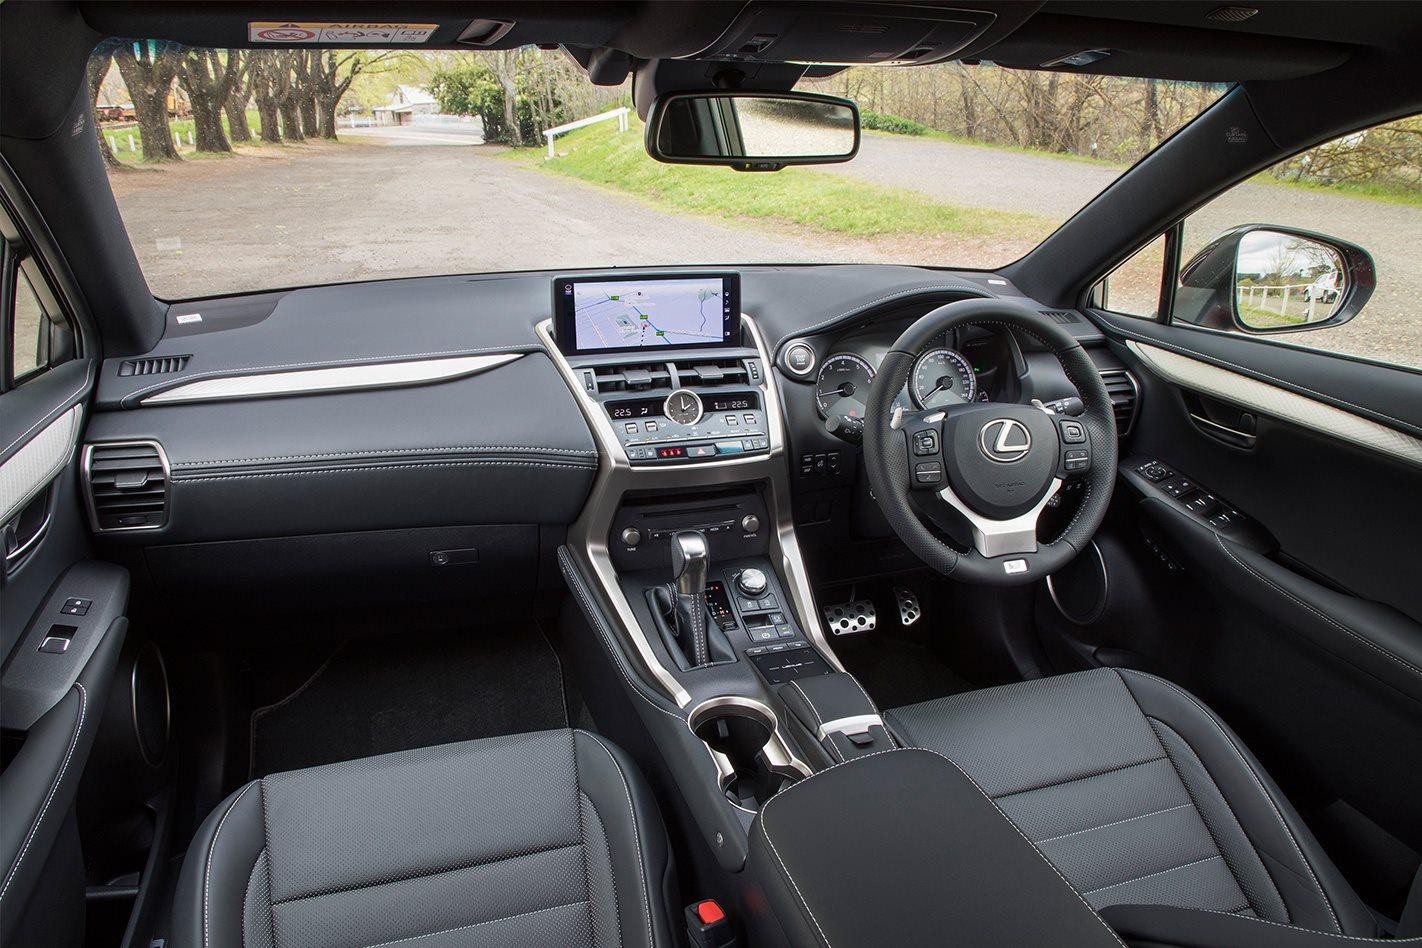 2018 Lexus NX300 Luxury AWD review